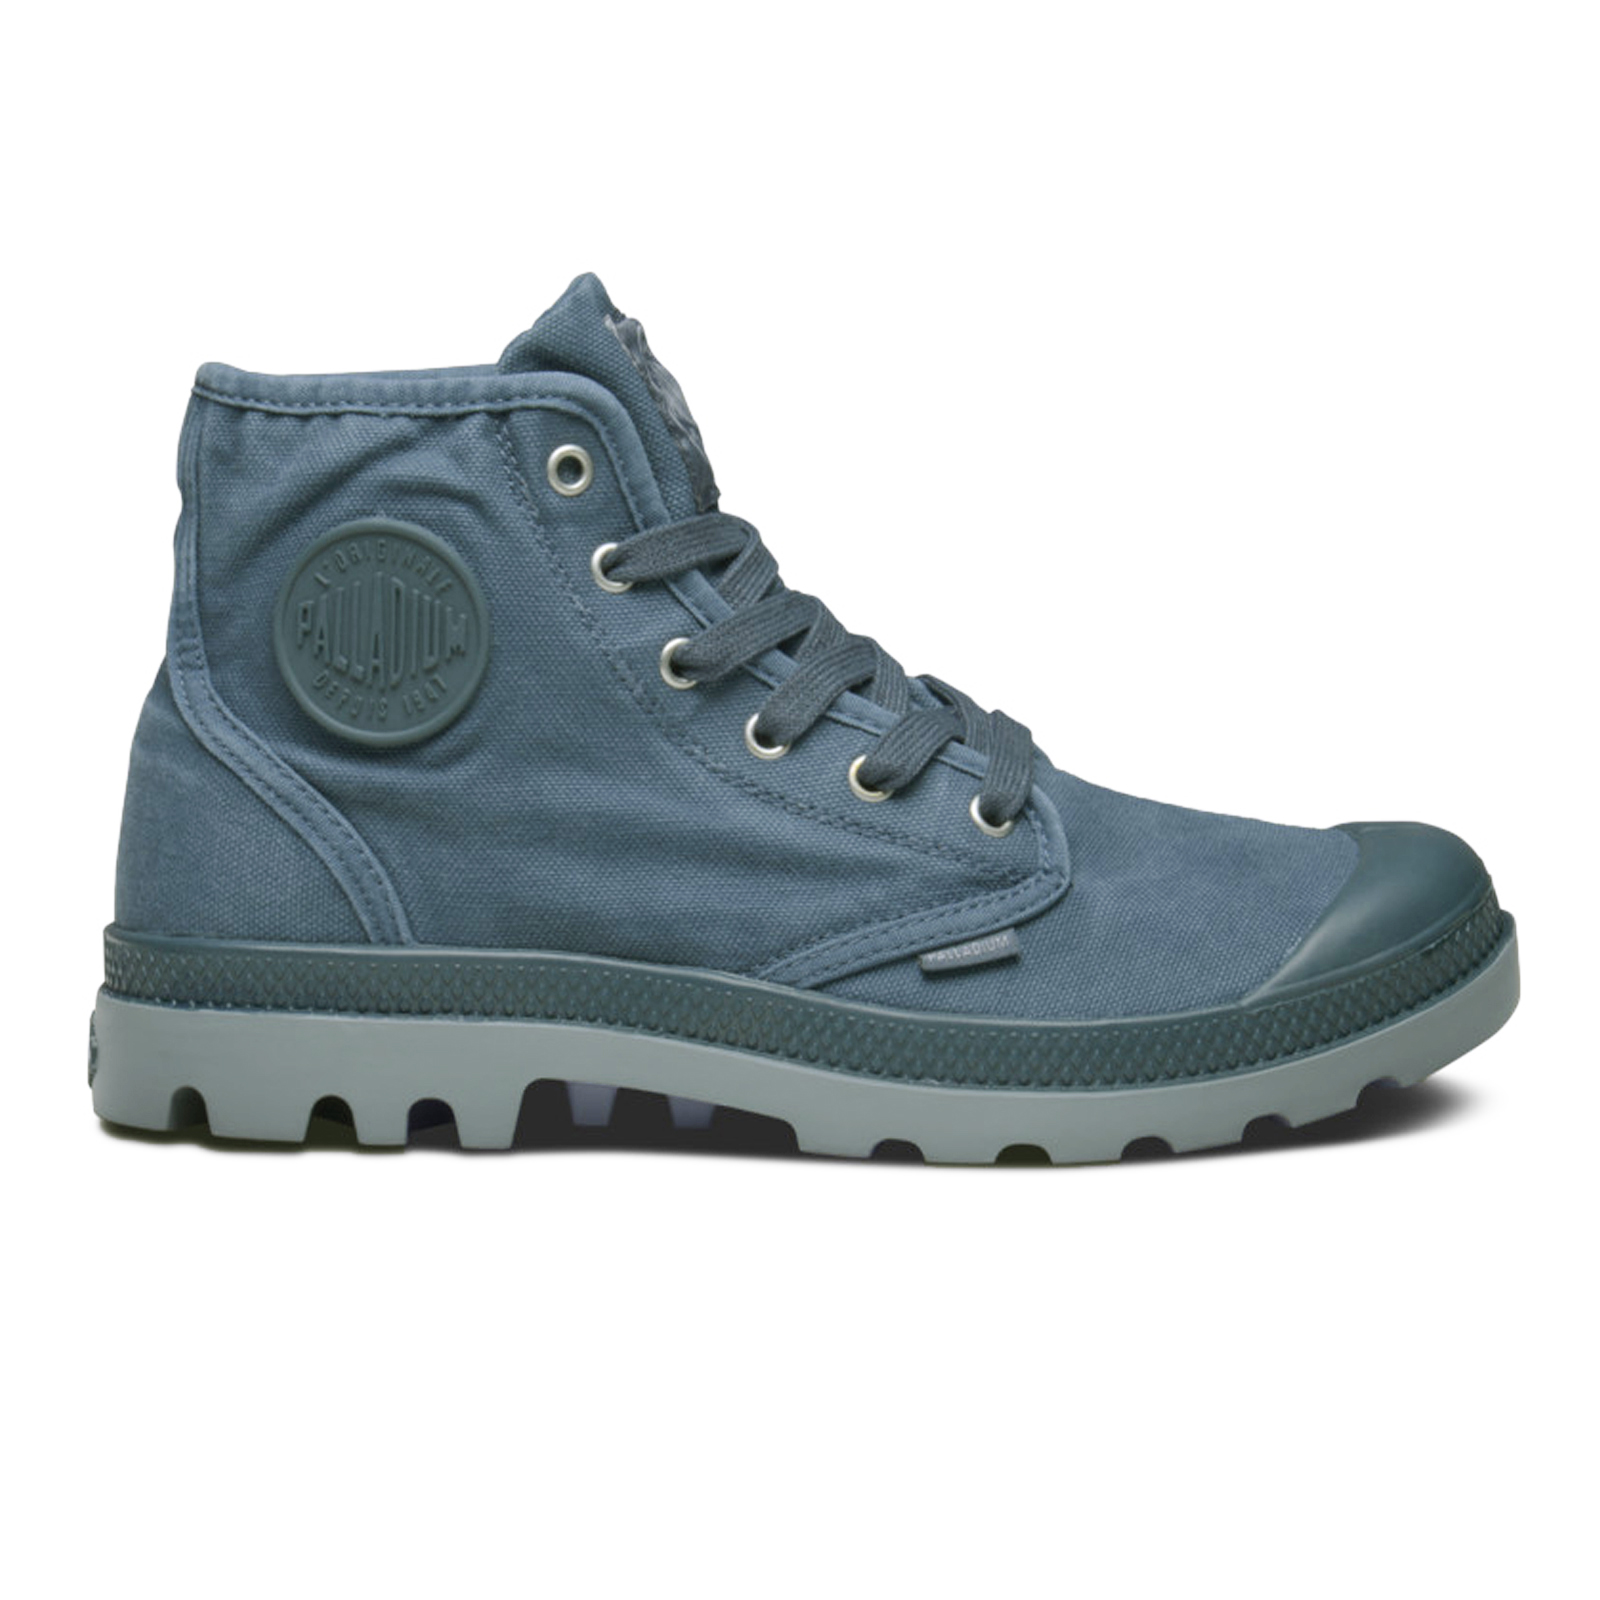 Palladium Mens Shoes Pampa Hi Canvas New Walking High Top ...